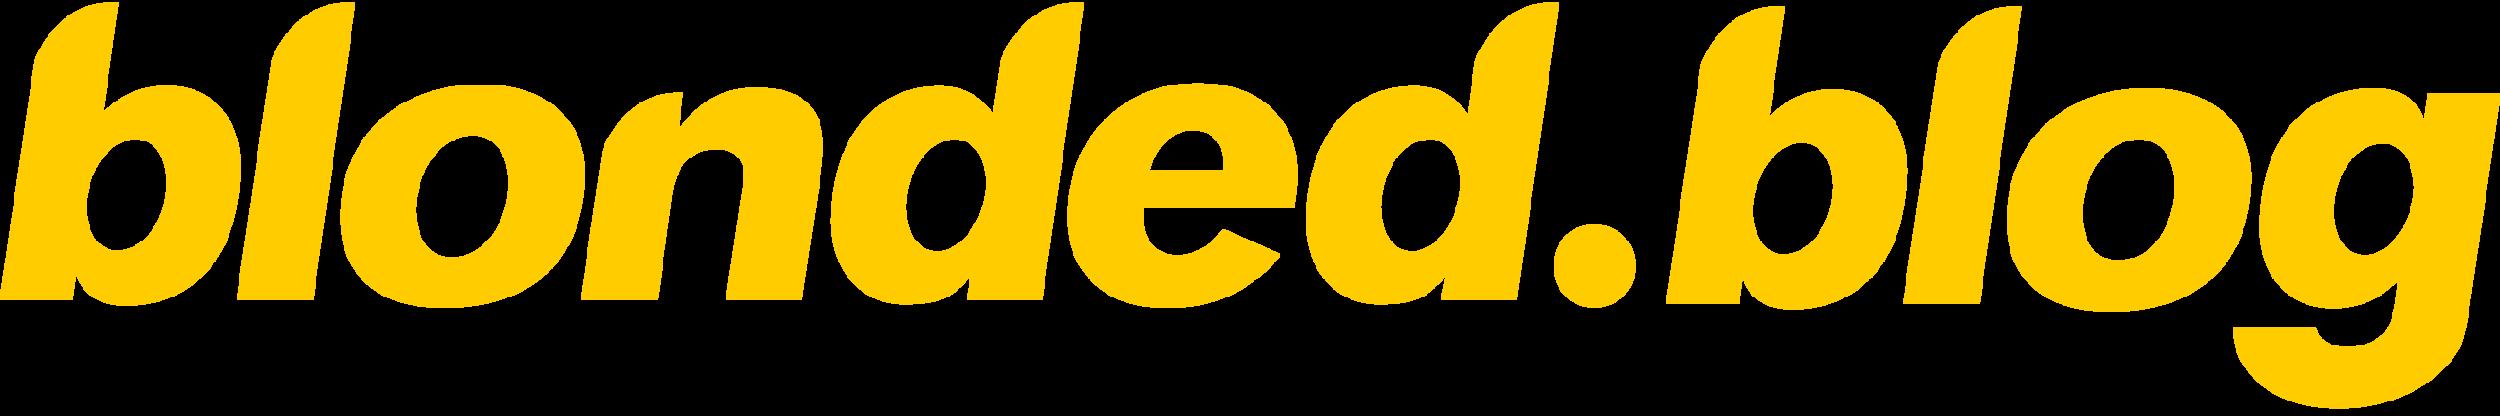 blonded blog logo